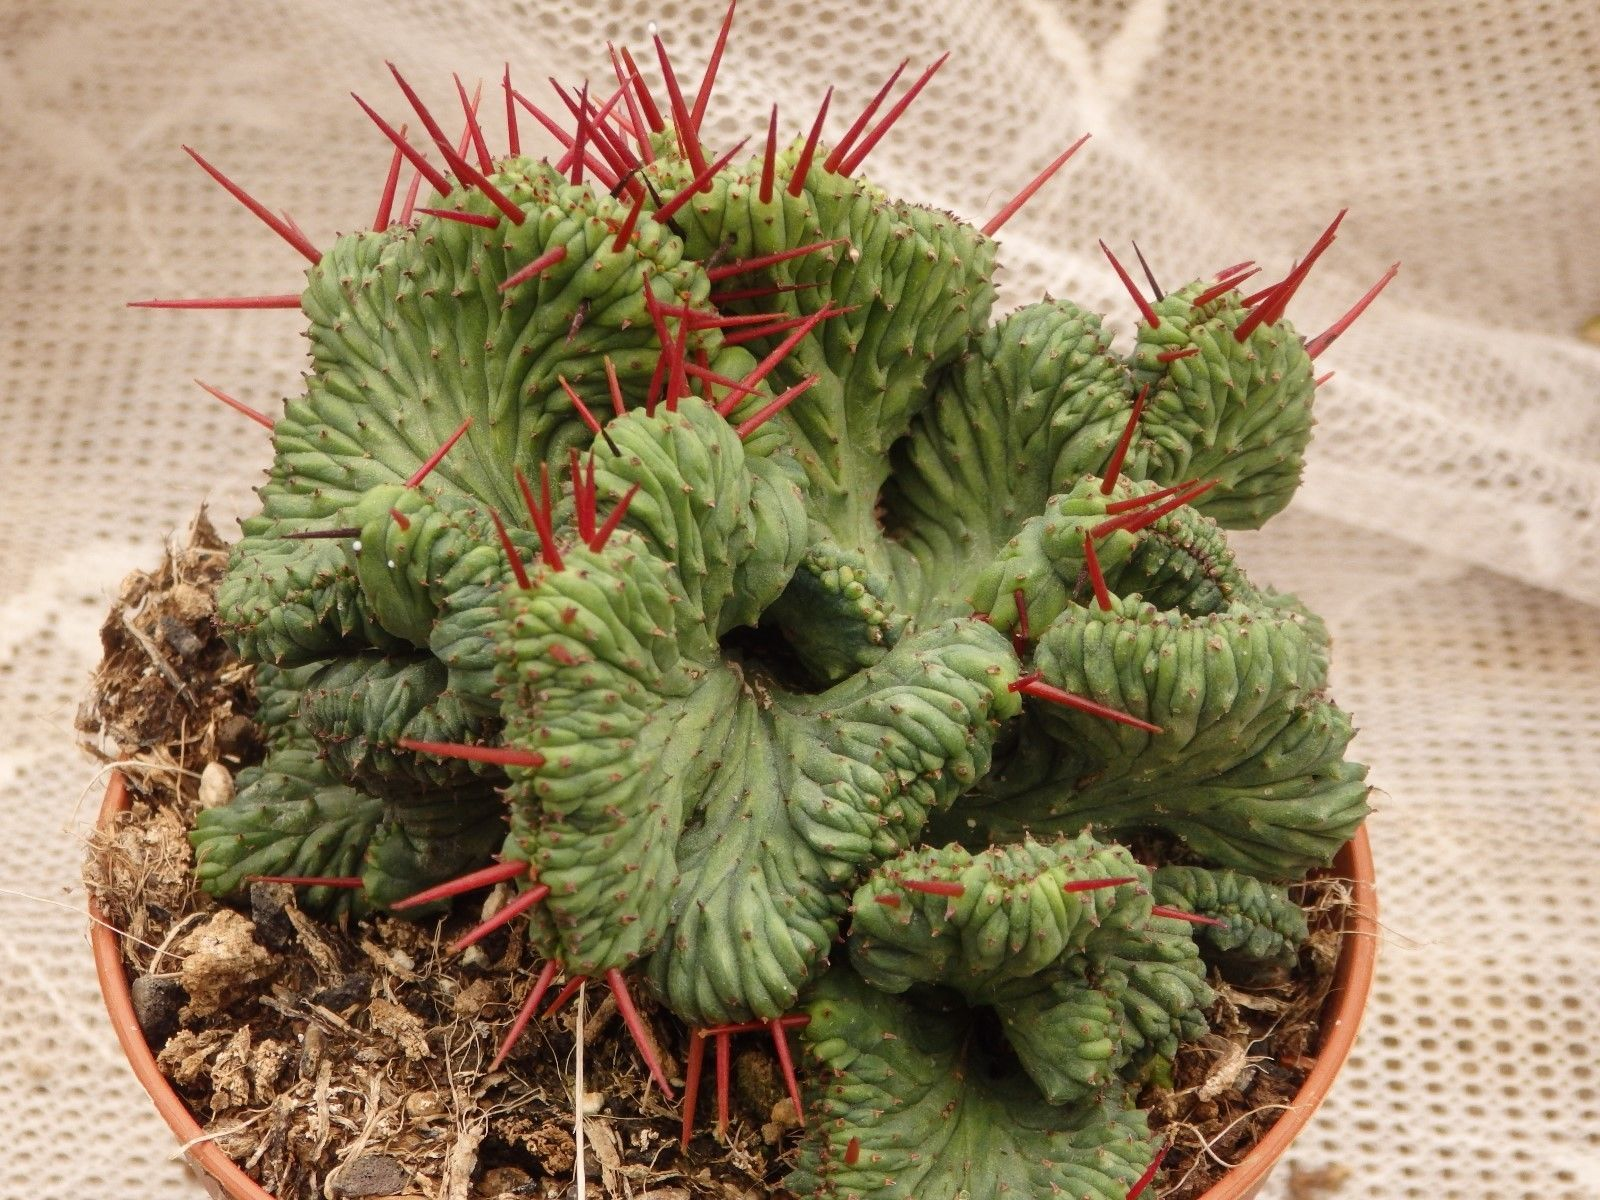 euphorbia enopla cristata ebay succulents pinterest cactus jardins et fleurs. Black Bedroom Furniture Sets. Home Design Ideas